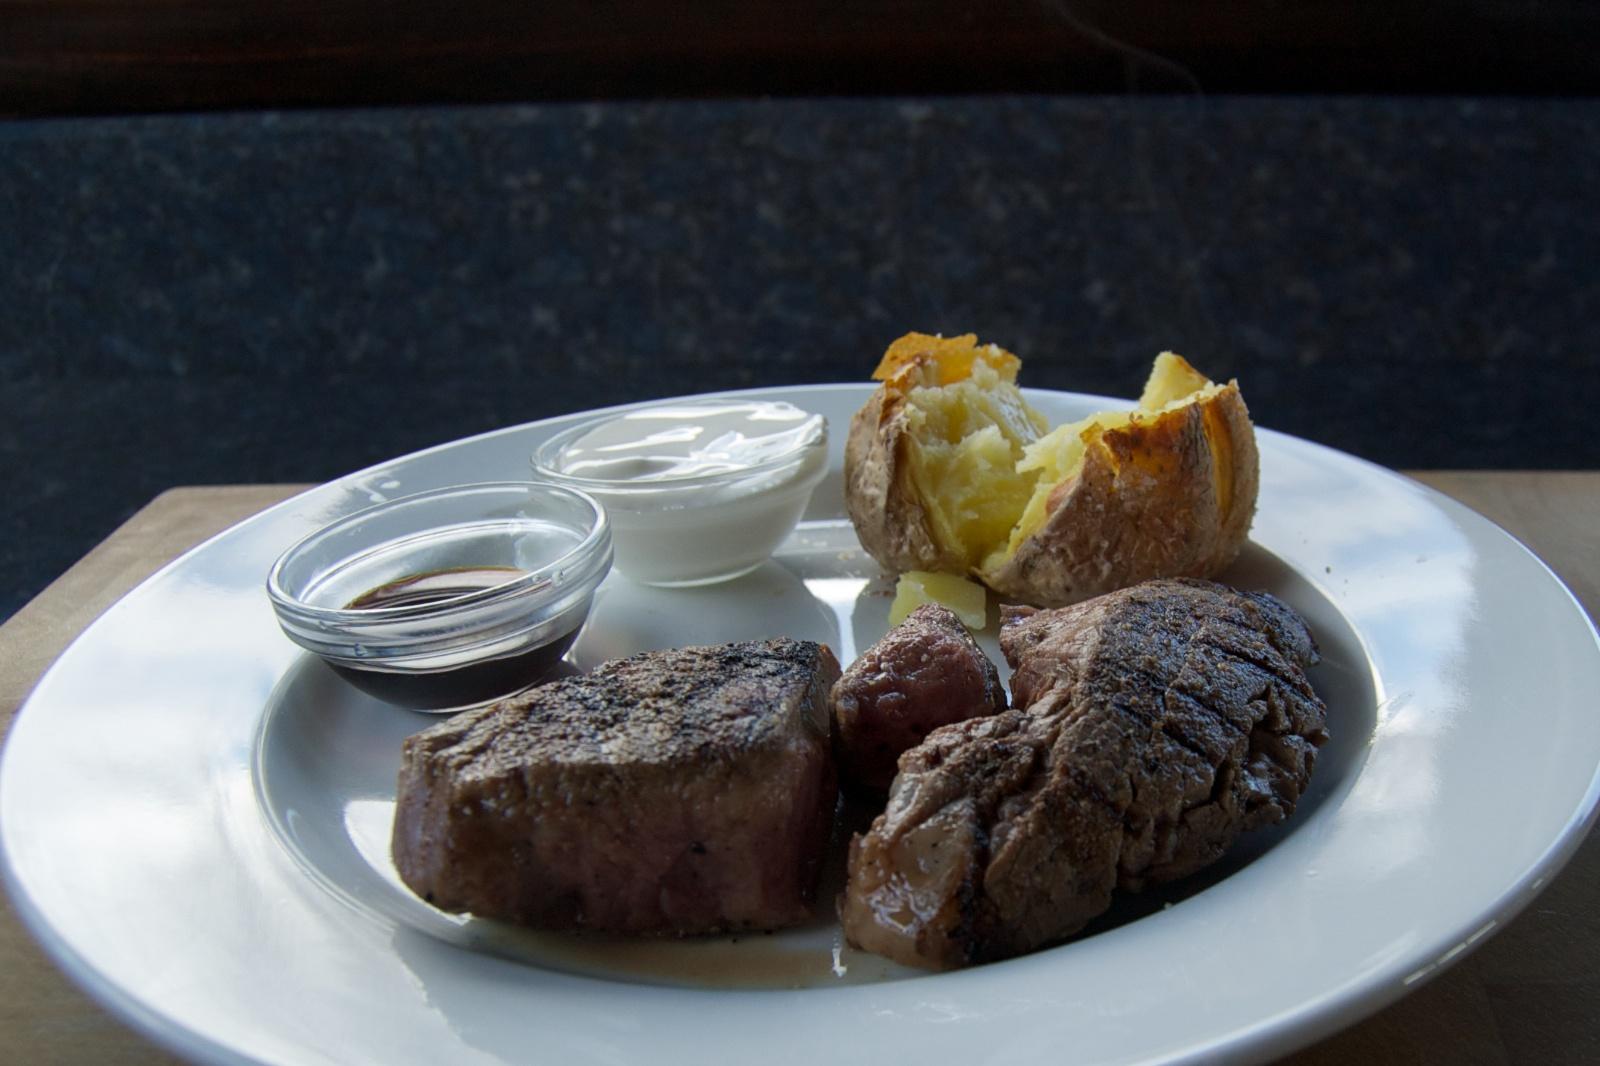 http://blog.rickk.com/food/2013/04/14/ate.2013.04.14.d.jpg